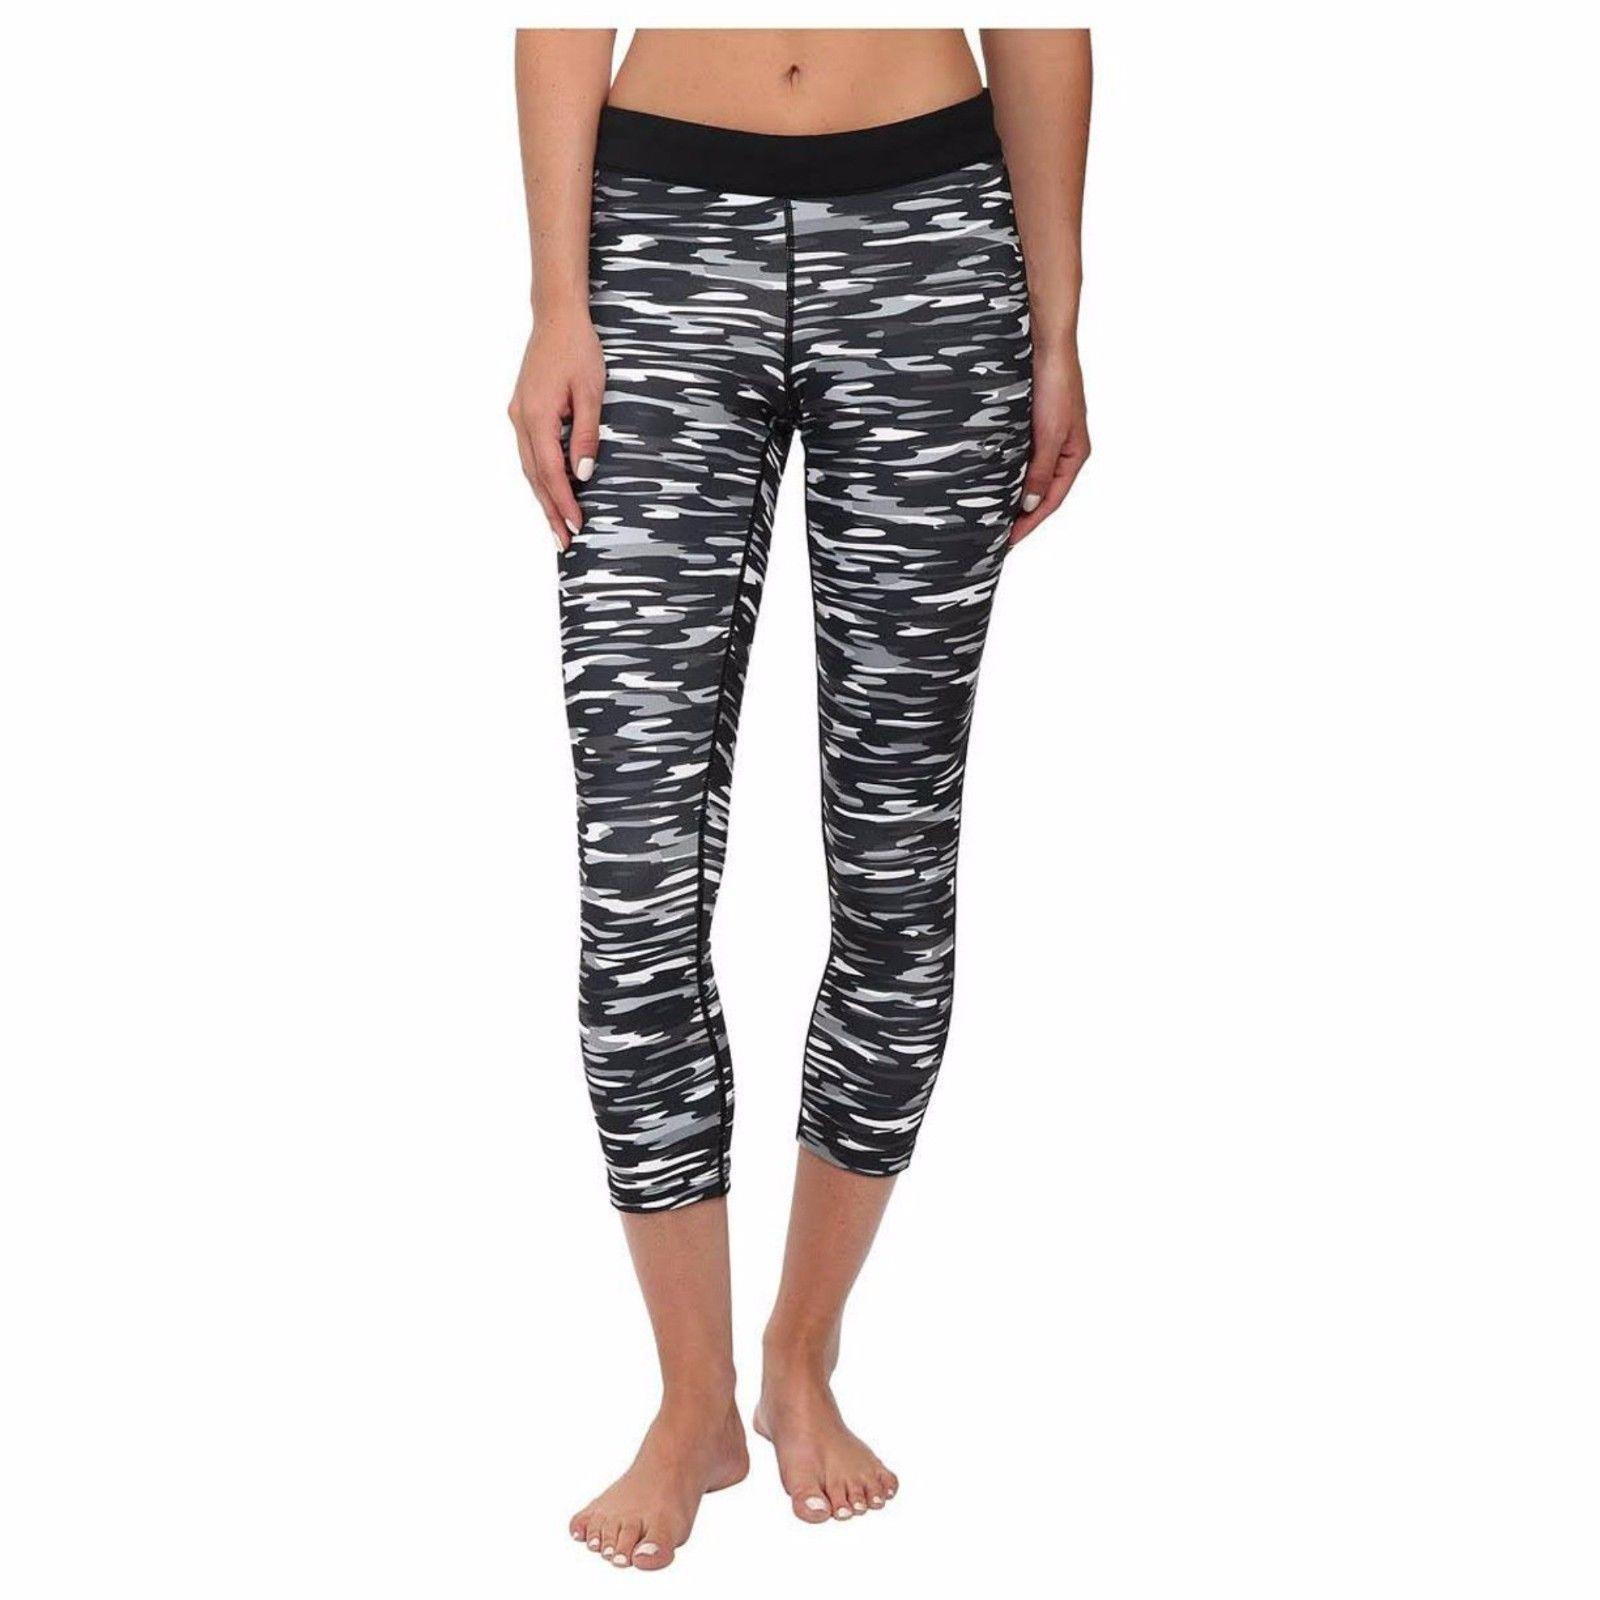 8df3d8484a Women's Nike Relay Foldover Capri Leggings Pants Size Medium Dri-Fit ...